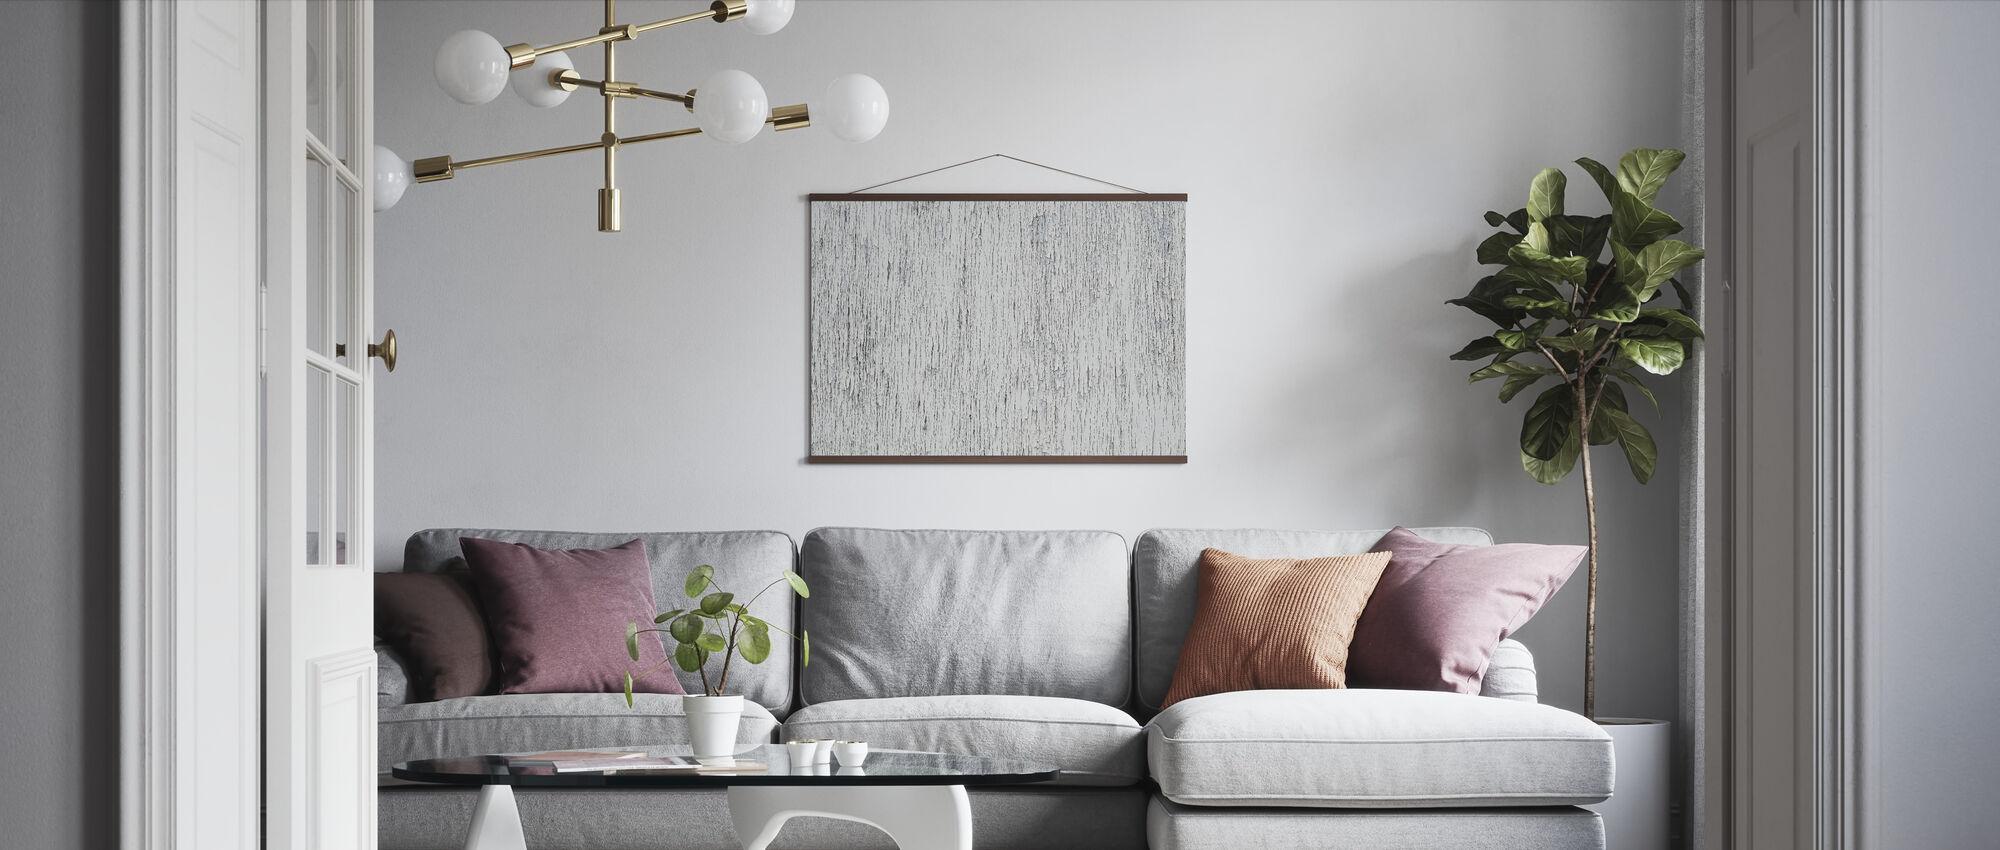 Sprukket hvit maling - Plakat - Stue